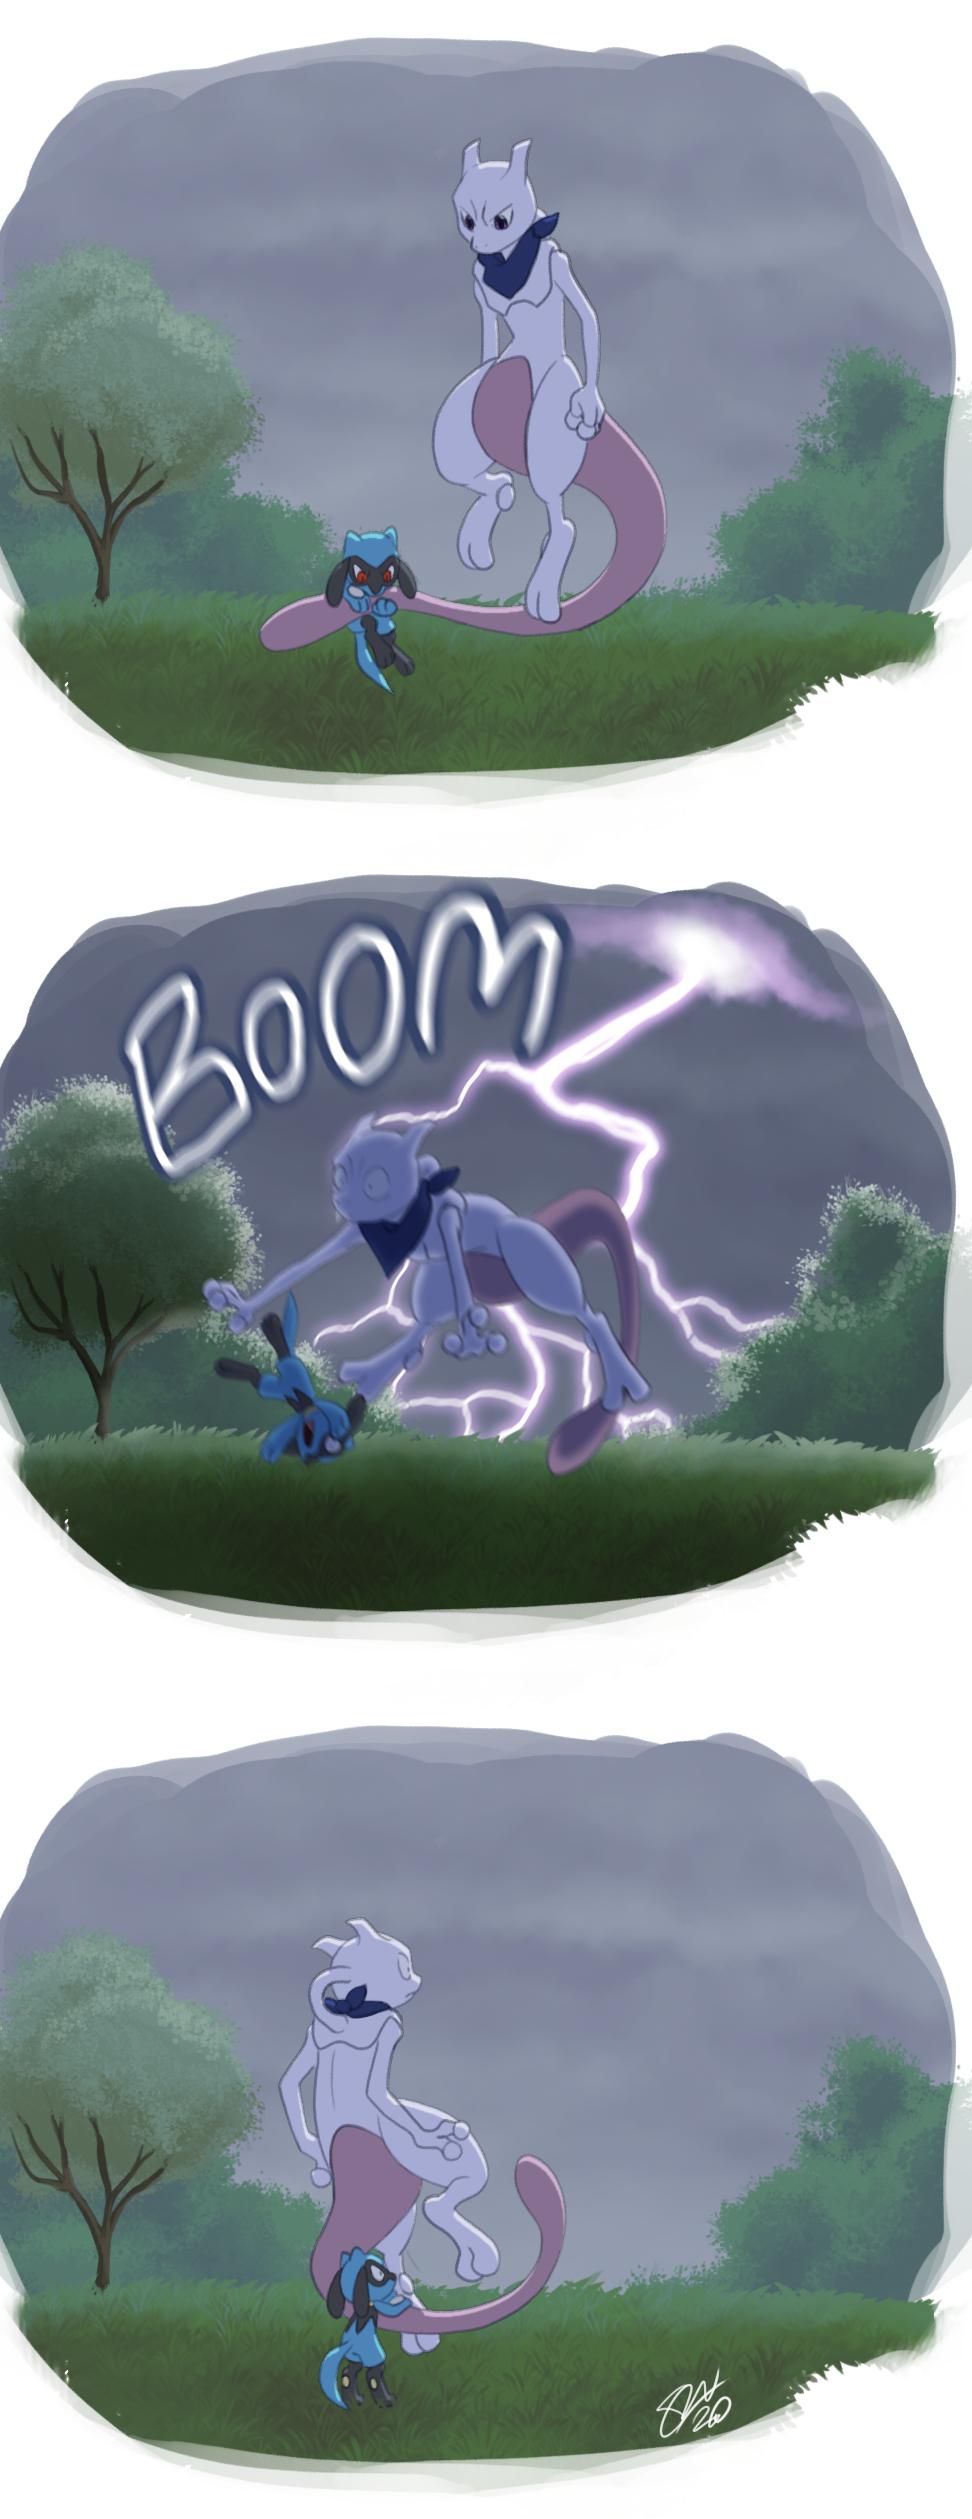 Lightning is rude